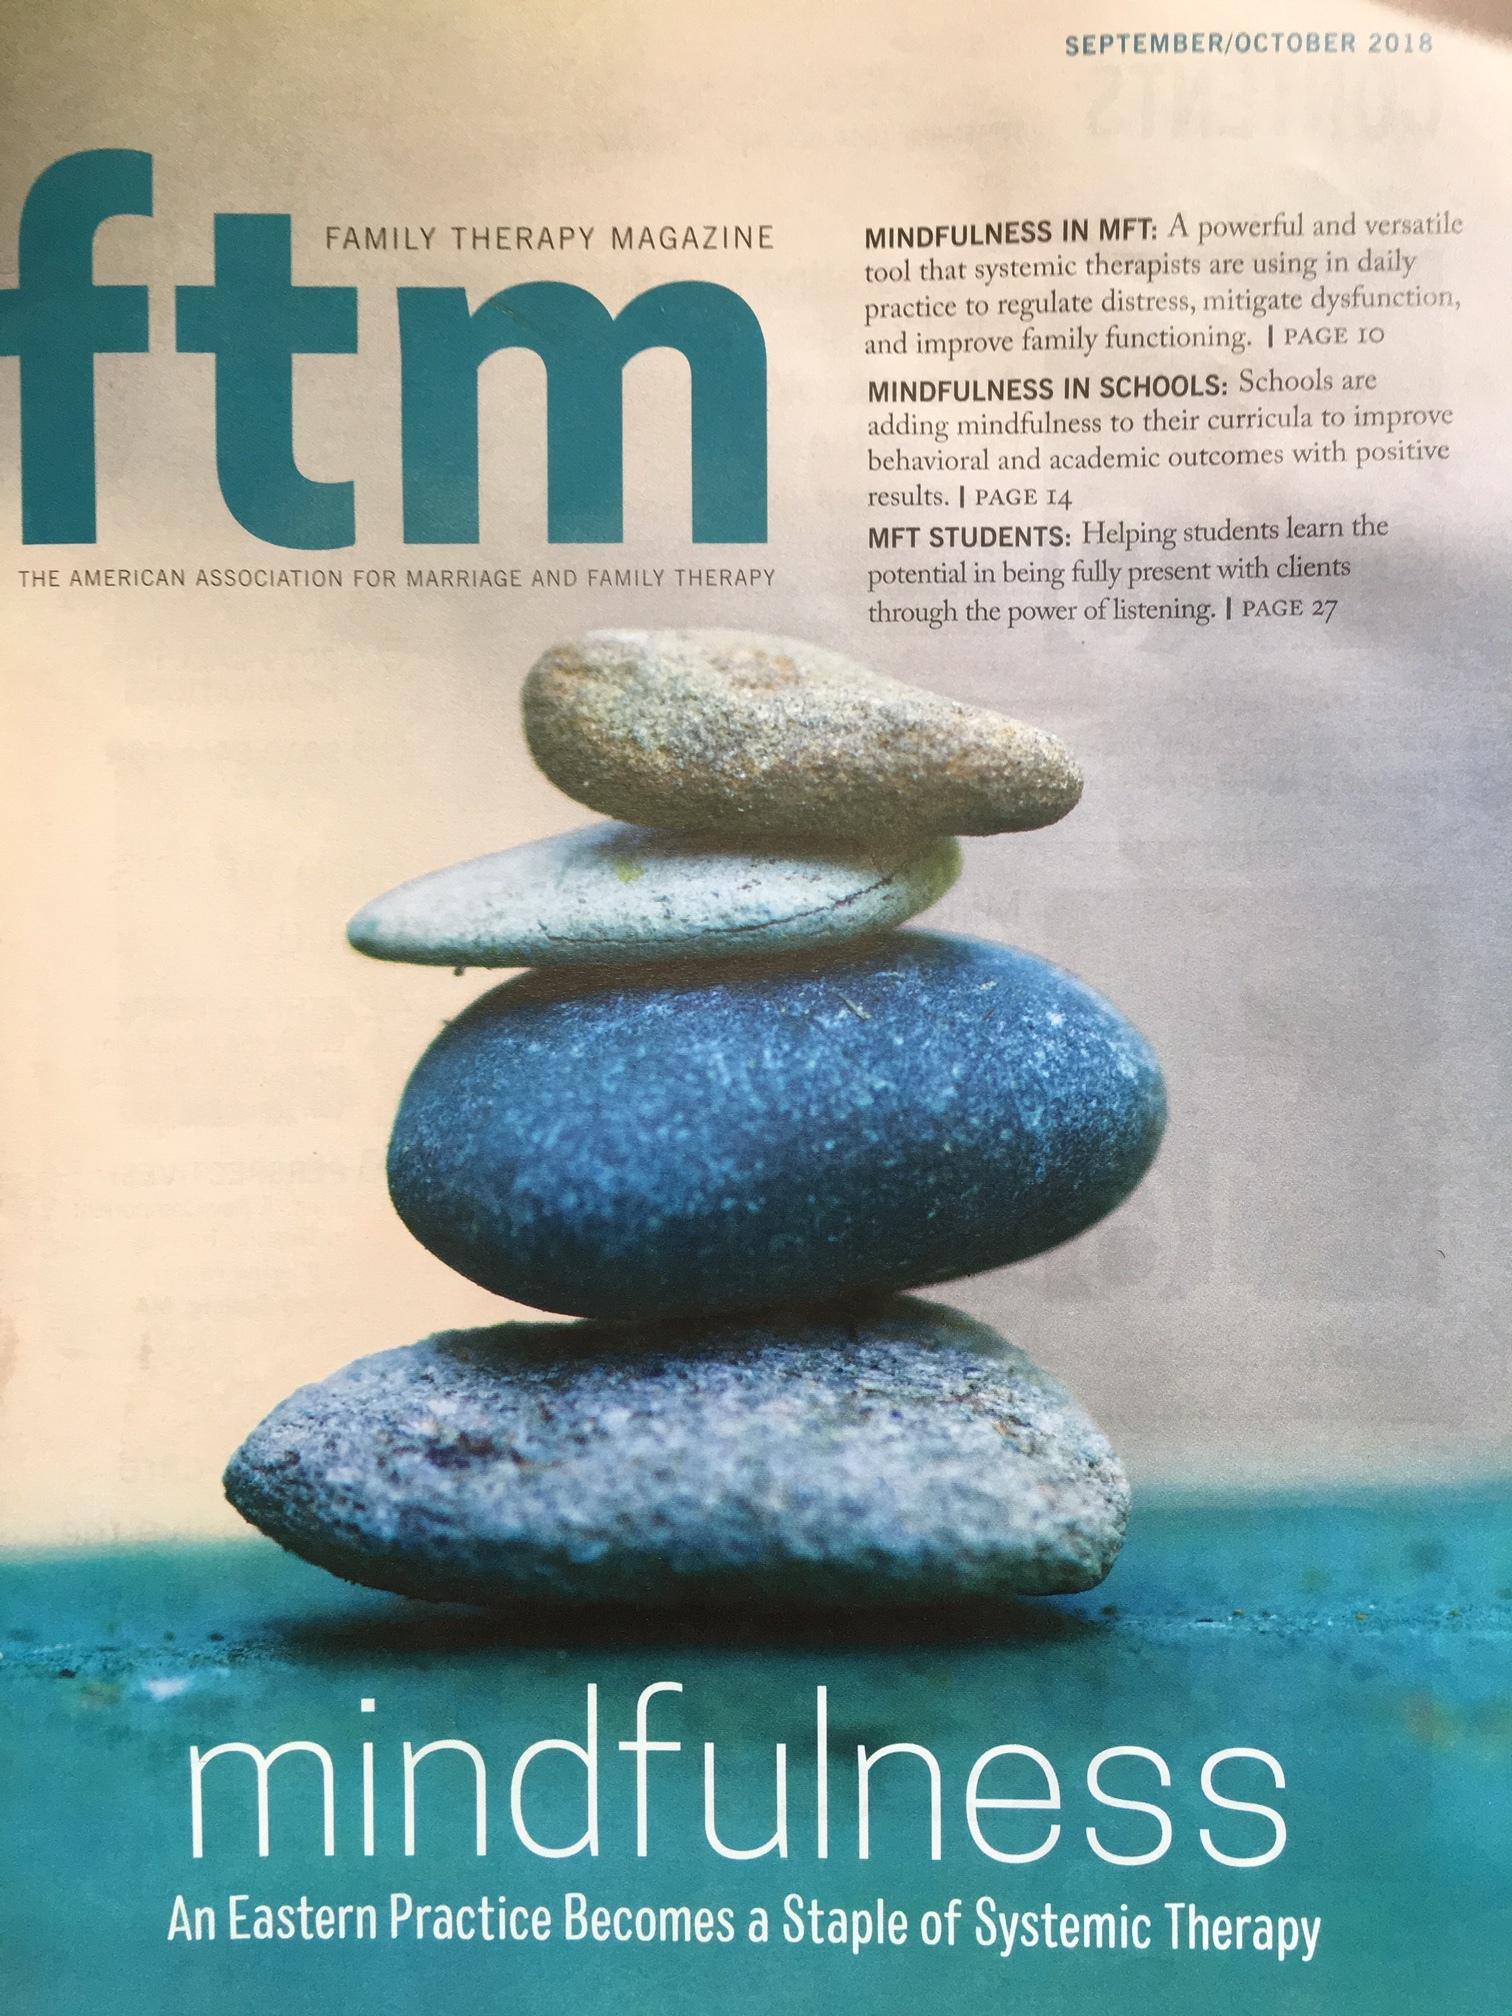 Family Therapy Magazine